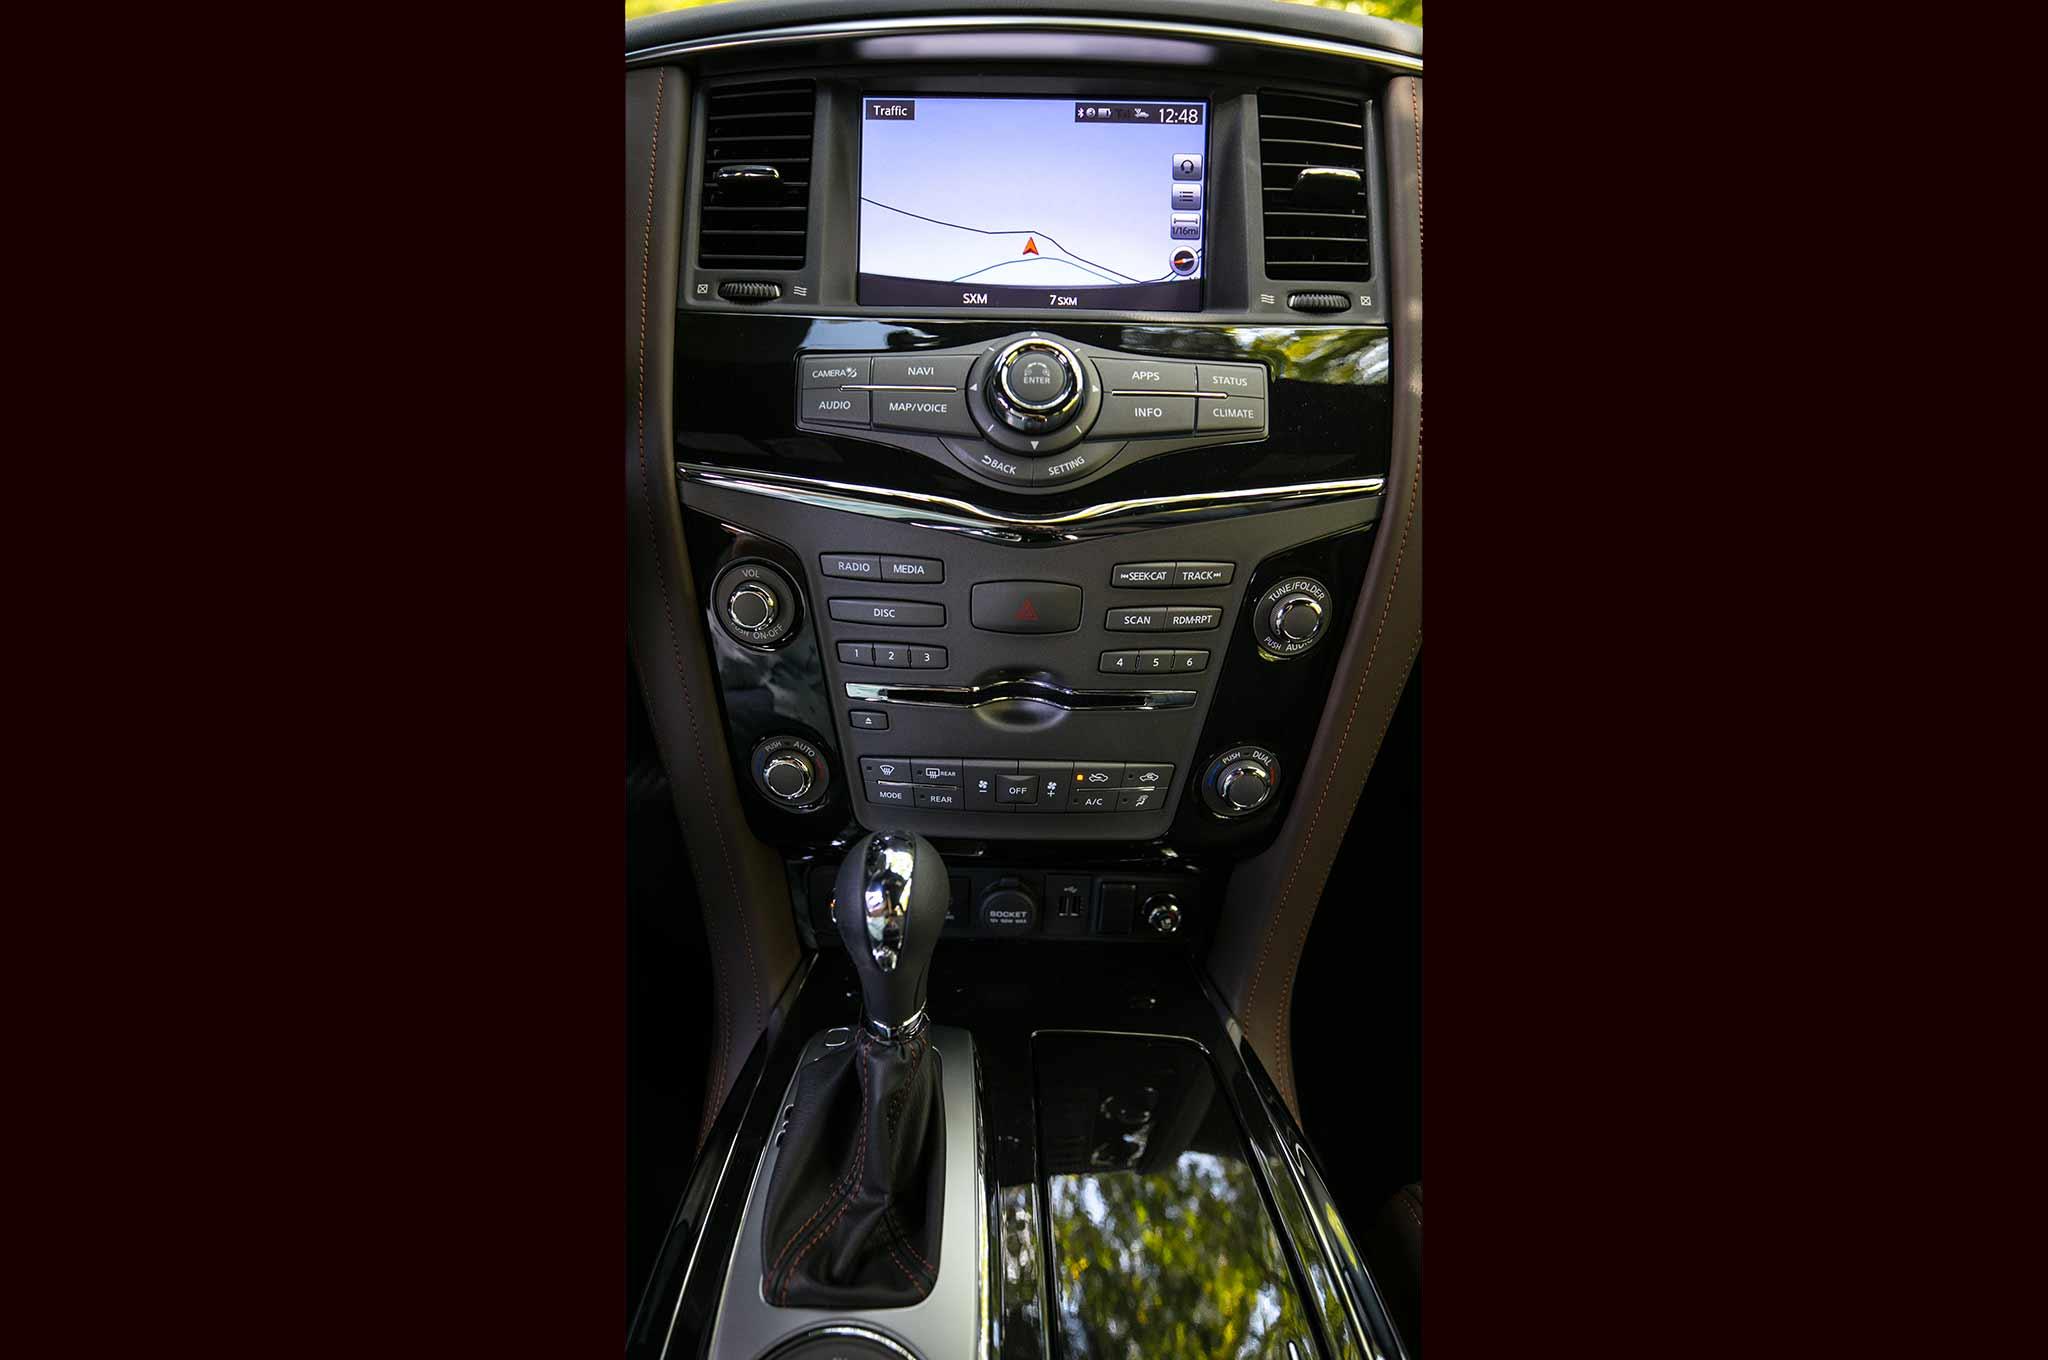 Nissan Armada Mpg >> 2018 Nissan Armada Platinum Reserve is Not a Credit Card, It's a Truck Trim | Automobile Magazine